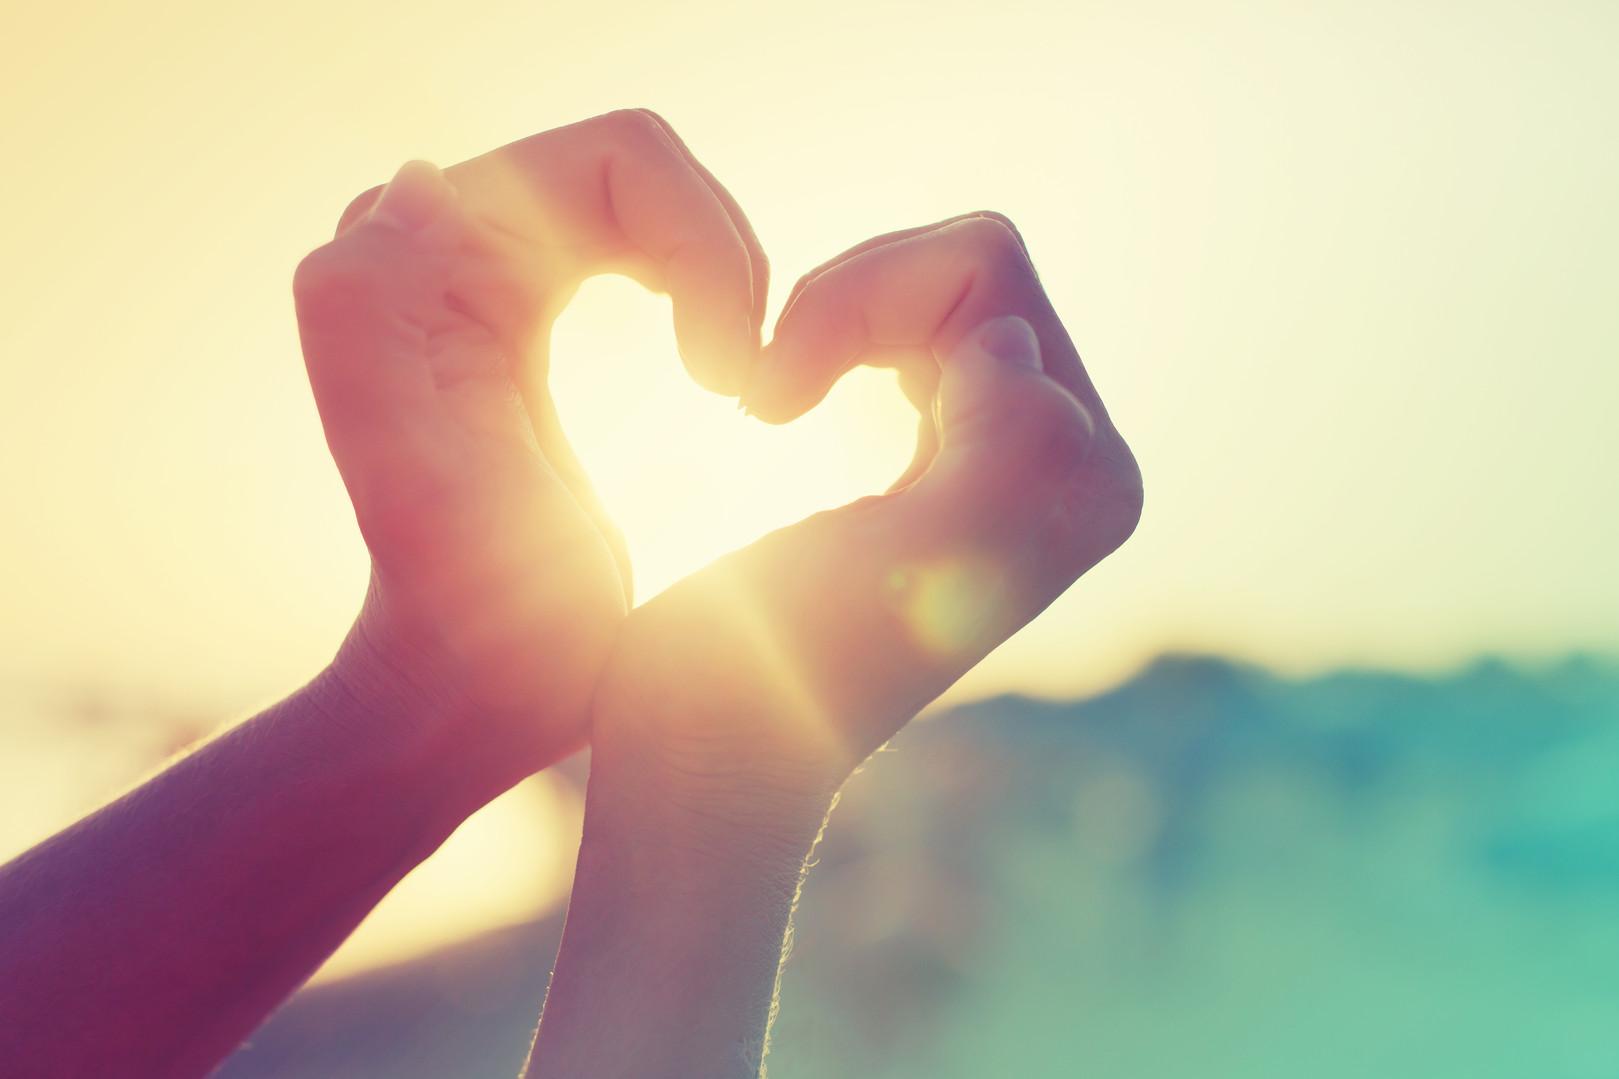 hands in heart shape framing setting su